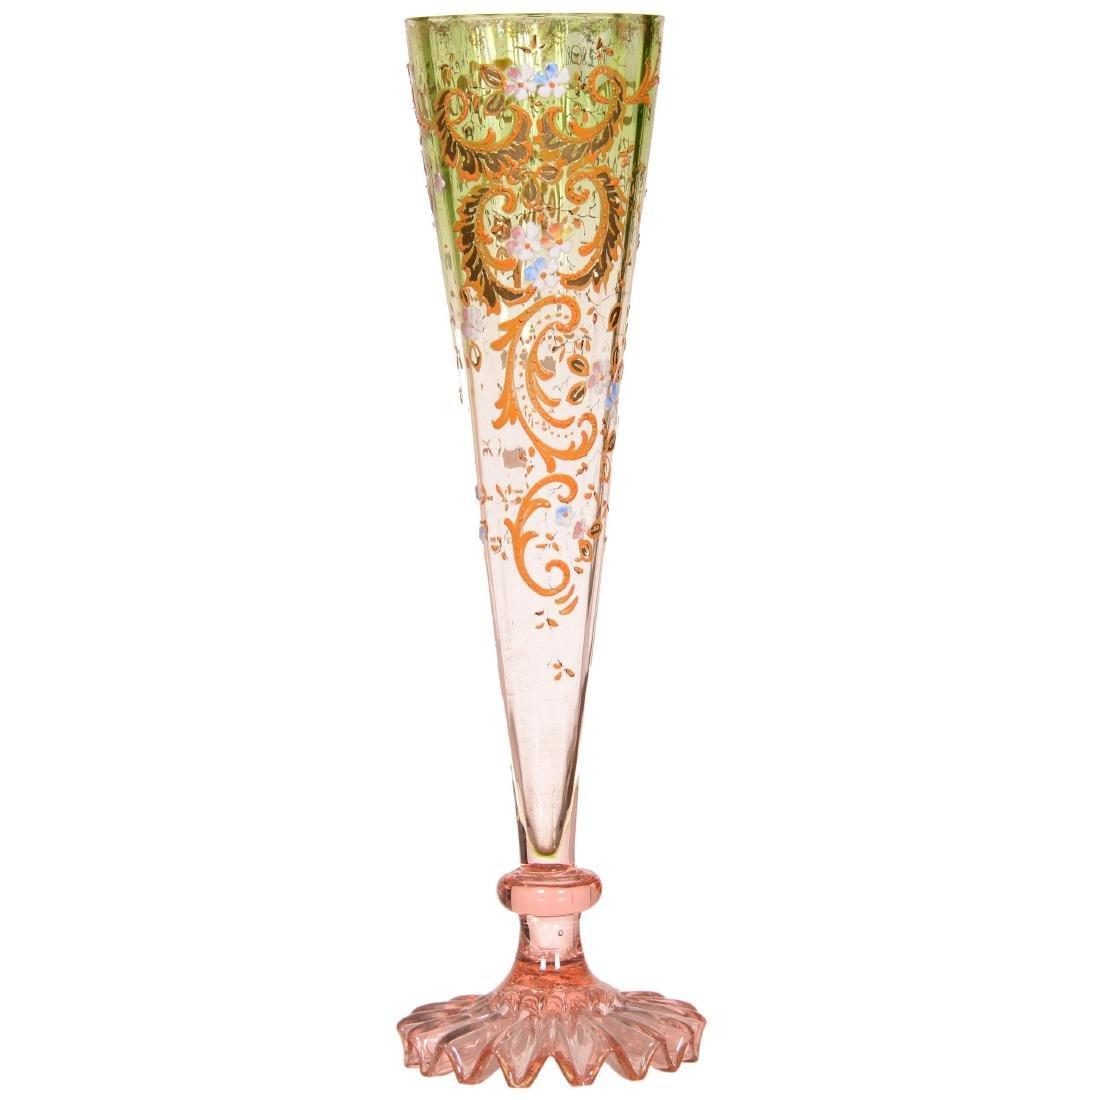 Art Glass Trumpet Vase